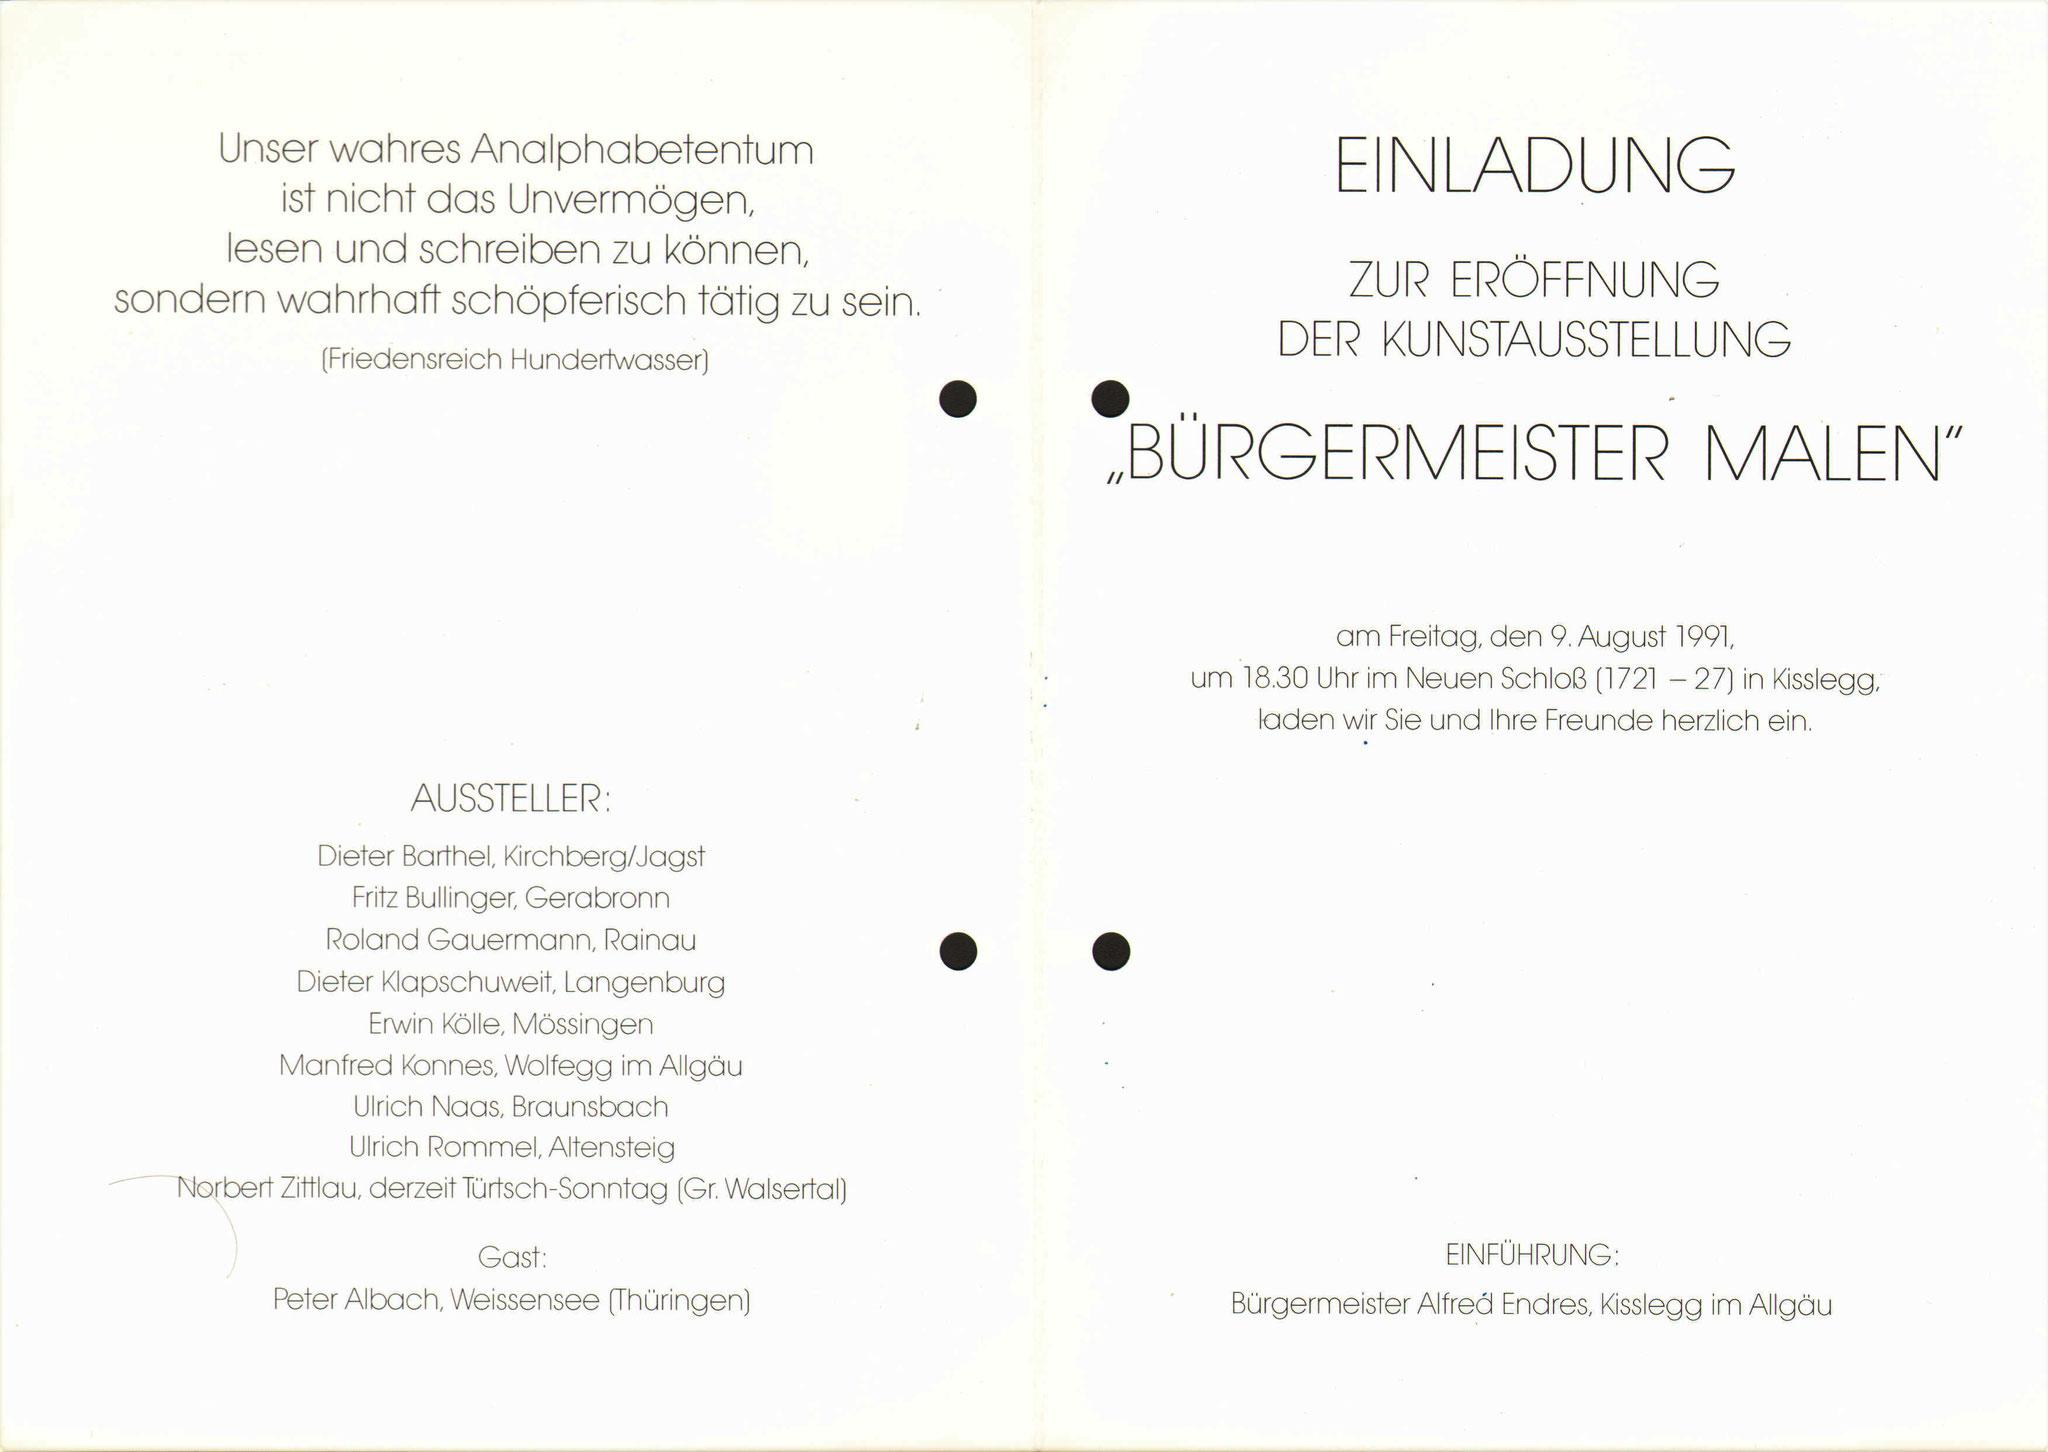 einladung -kunstausstellung-kisslegg-gast-peter-albach